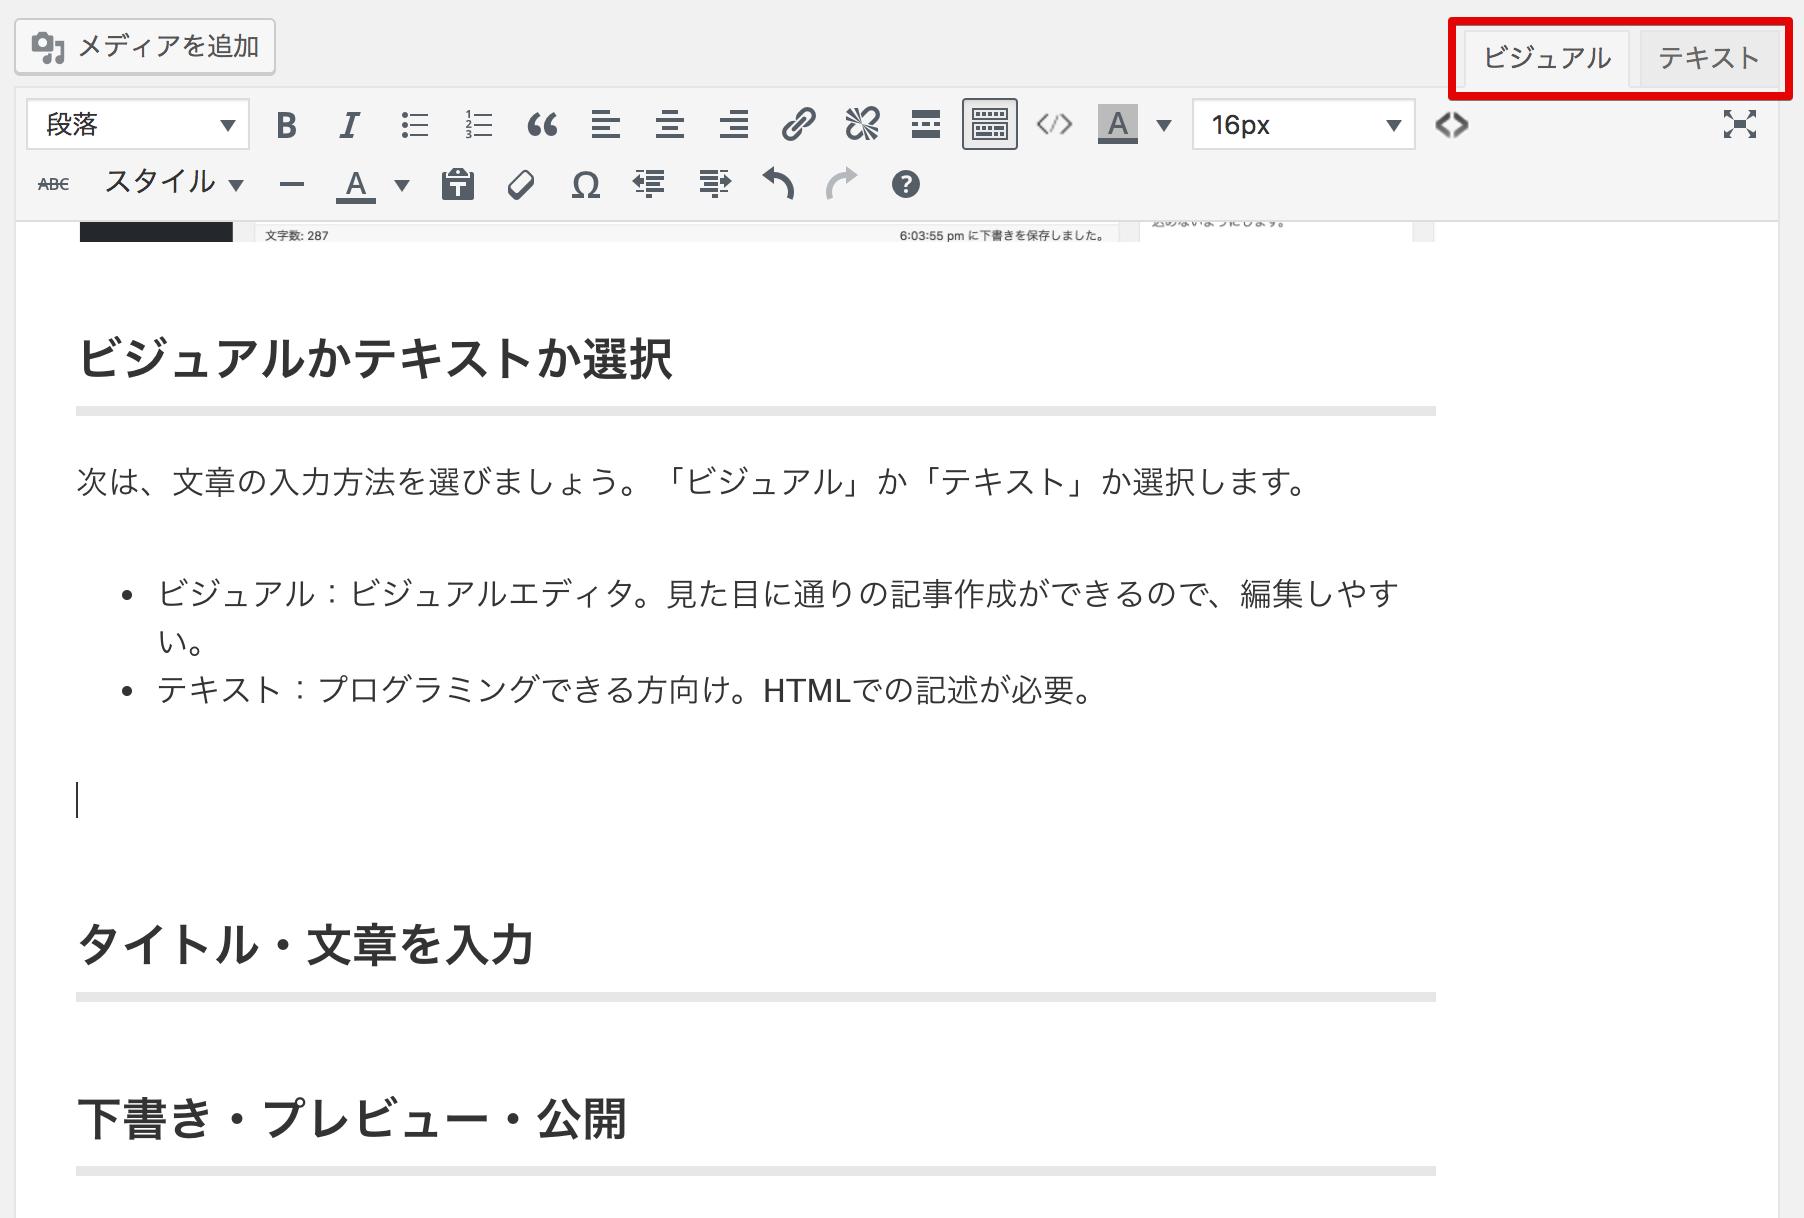 07893ceba76109df290fa006f0a2a82f - 初心者向け!WordPressの投稿方法や記事の編集方法を徹底解説